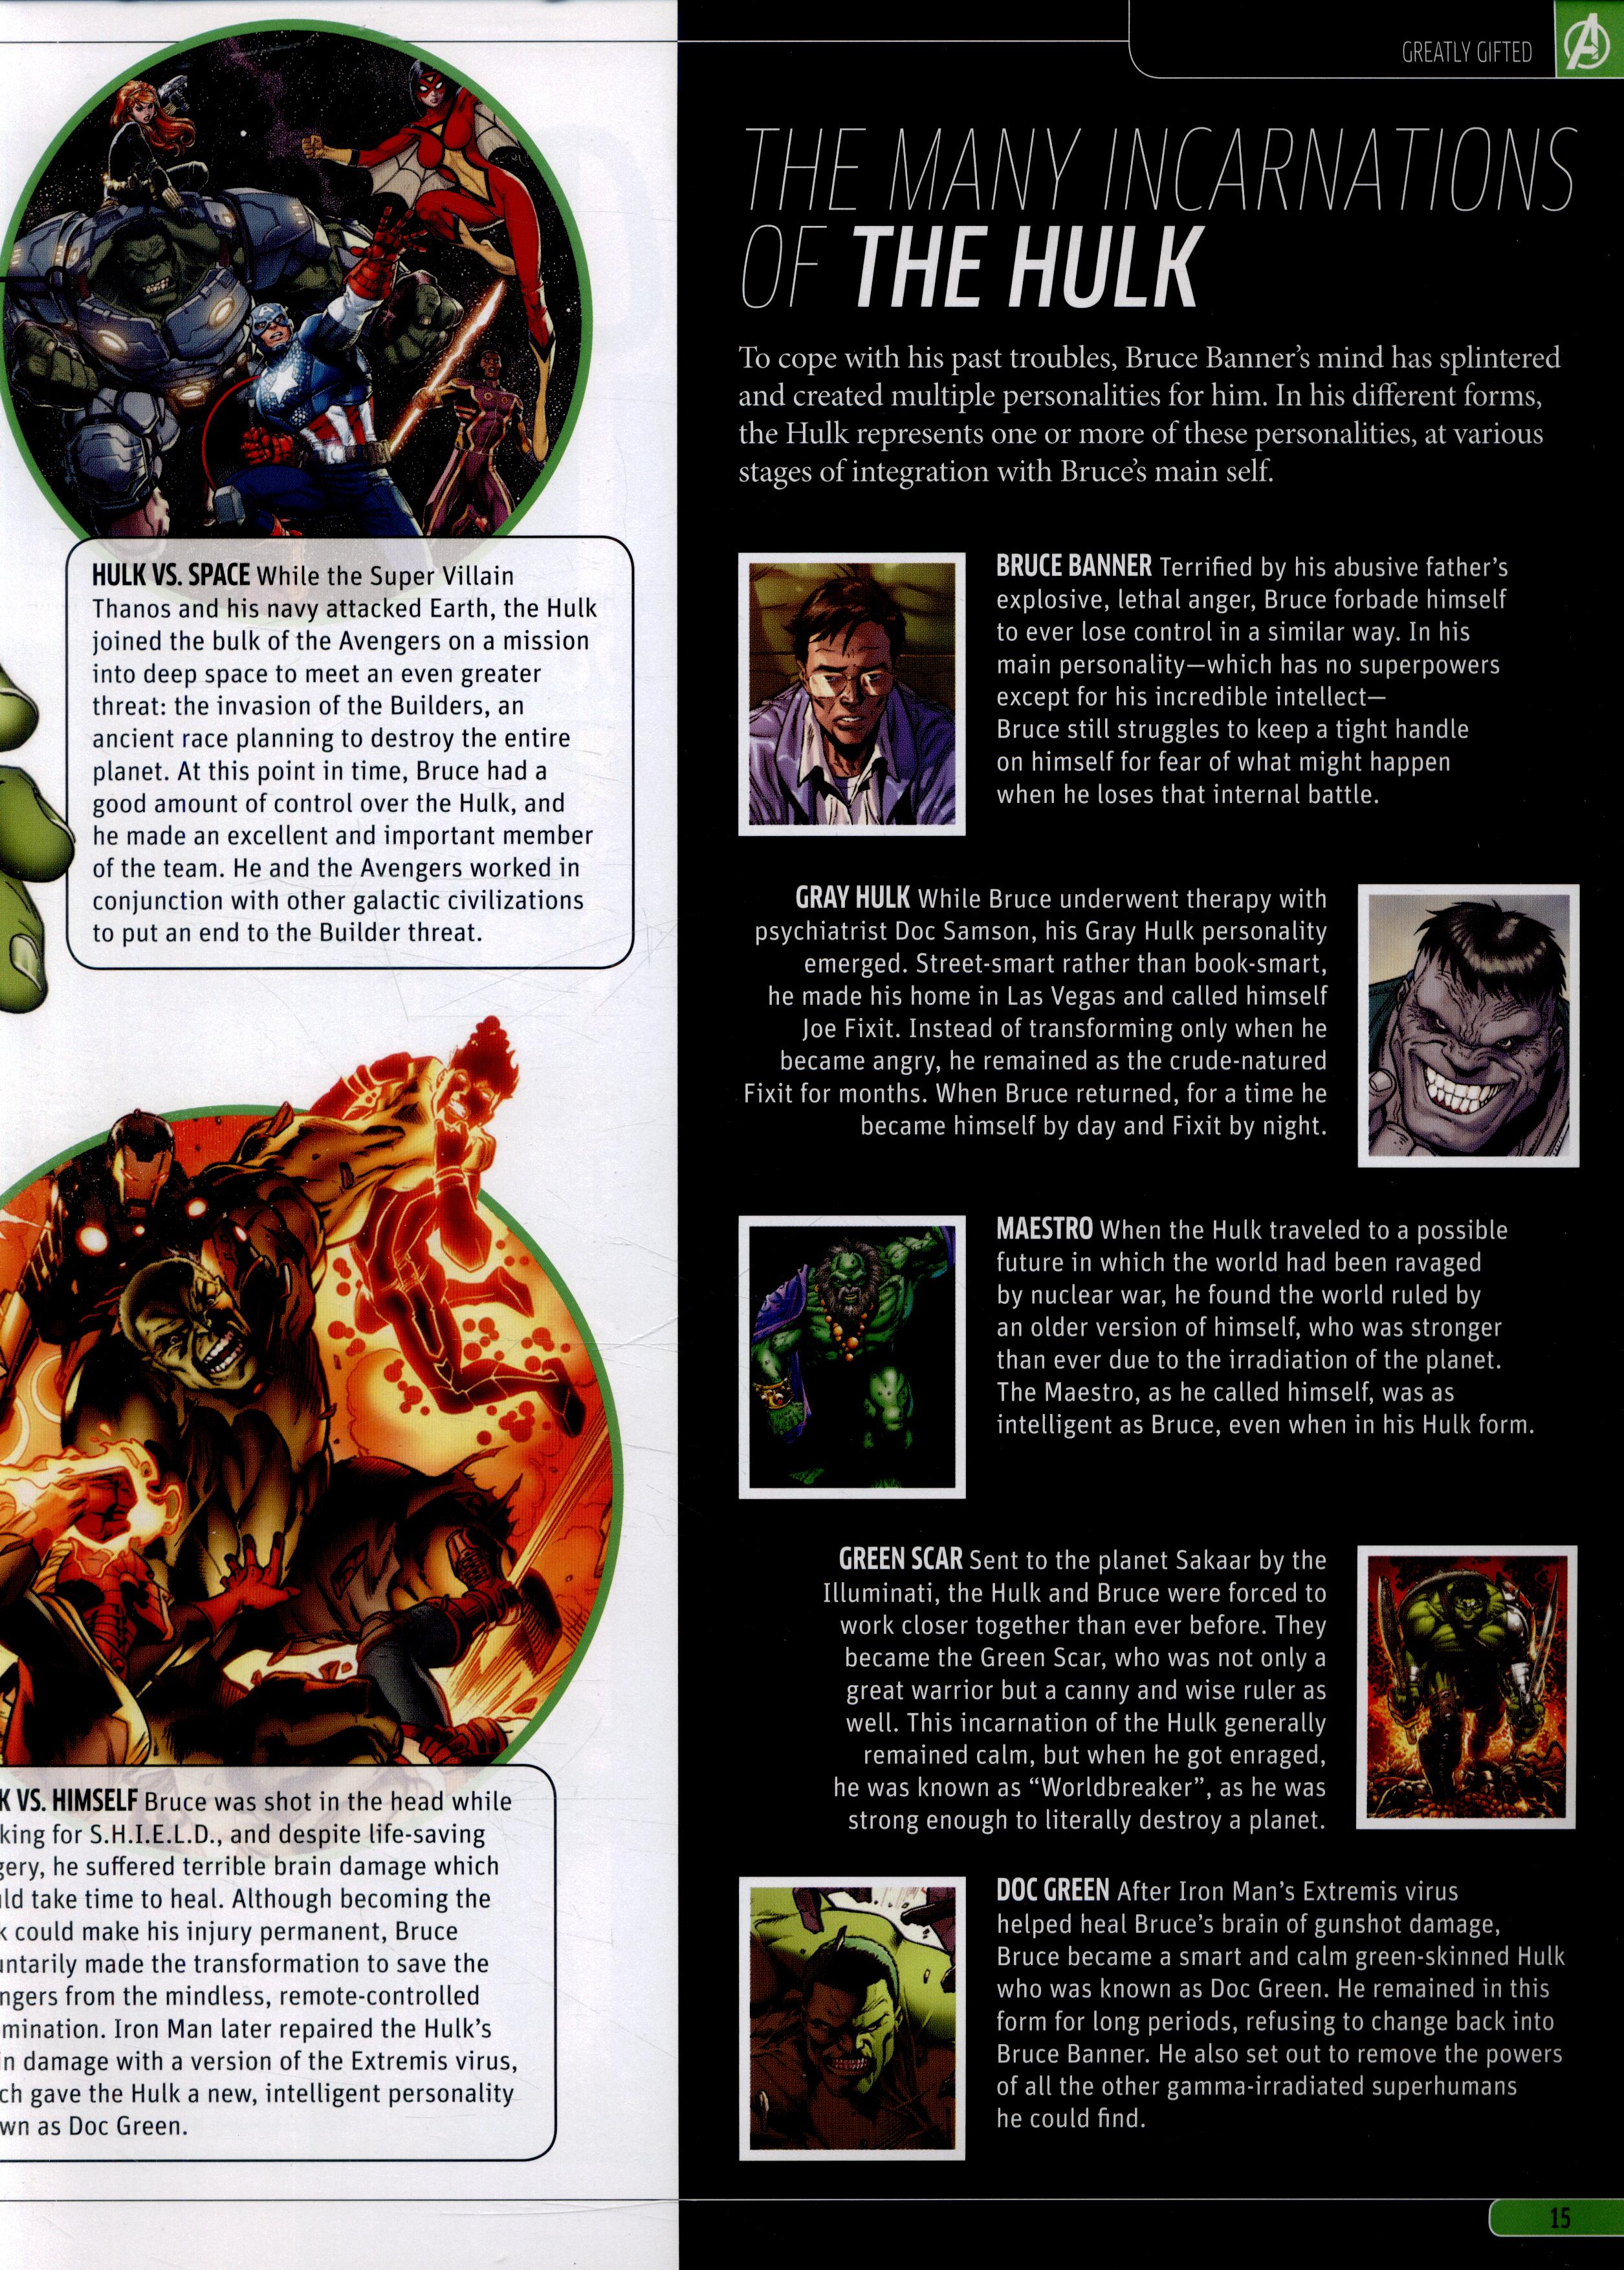 The Avengers encyclopedia by DK (9780241183717)   BrownsBfS